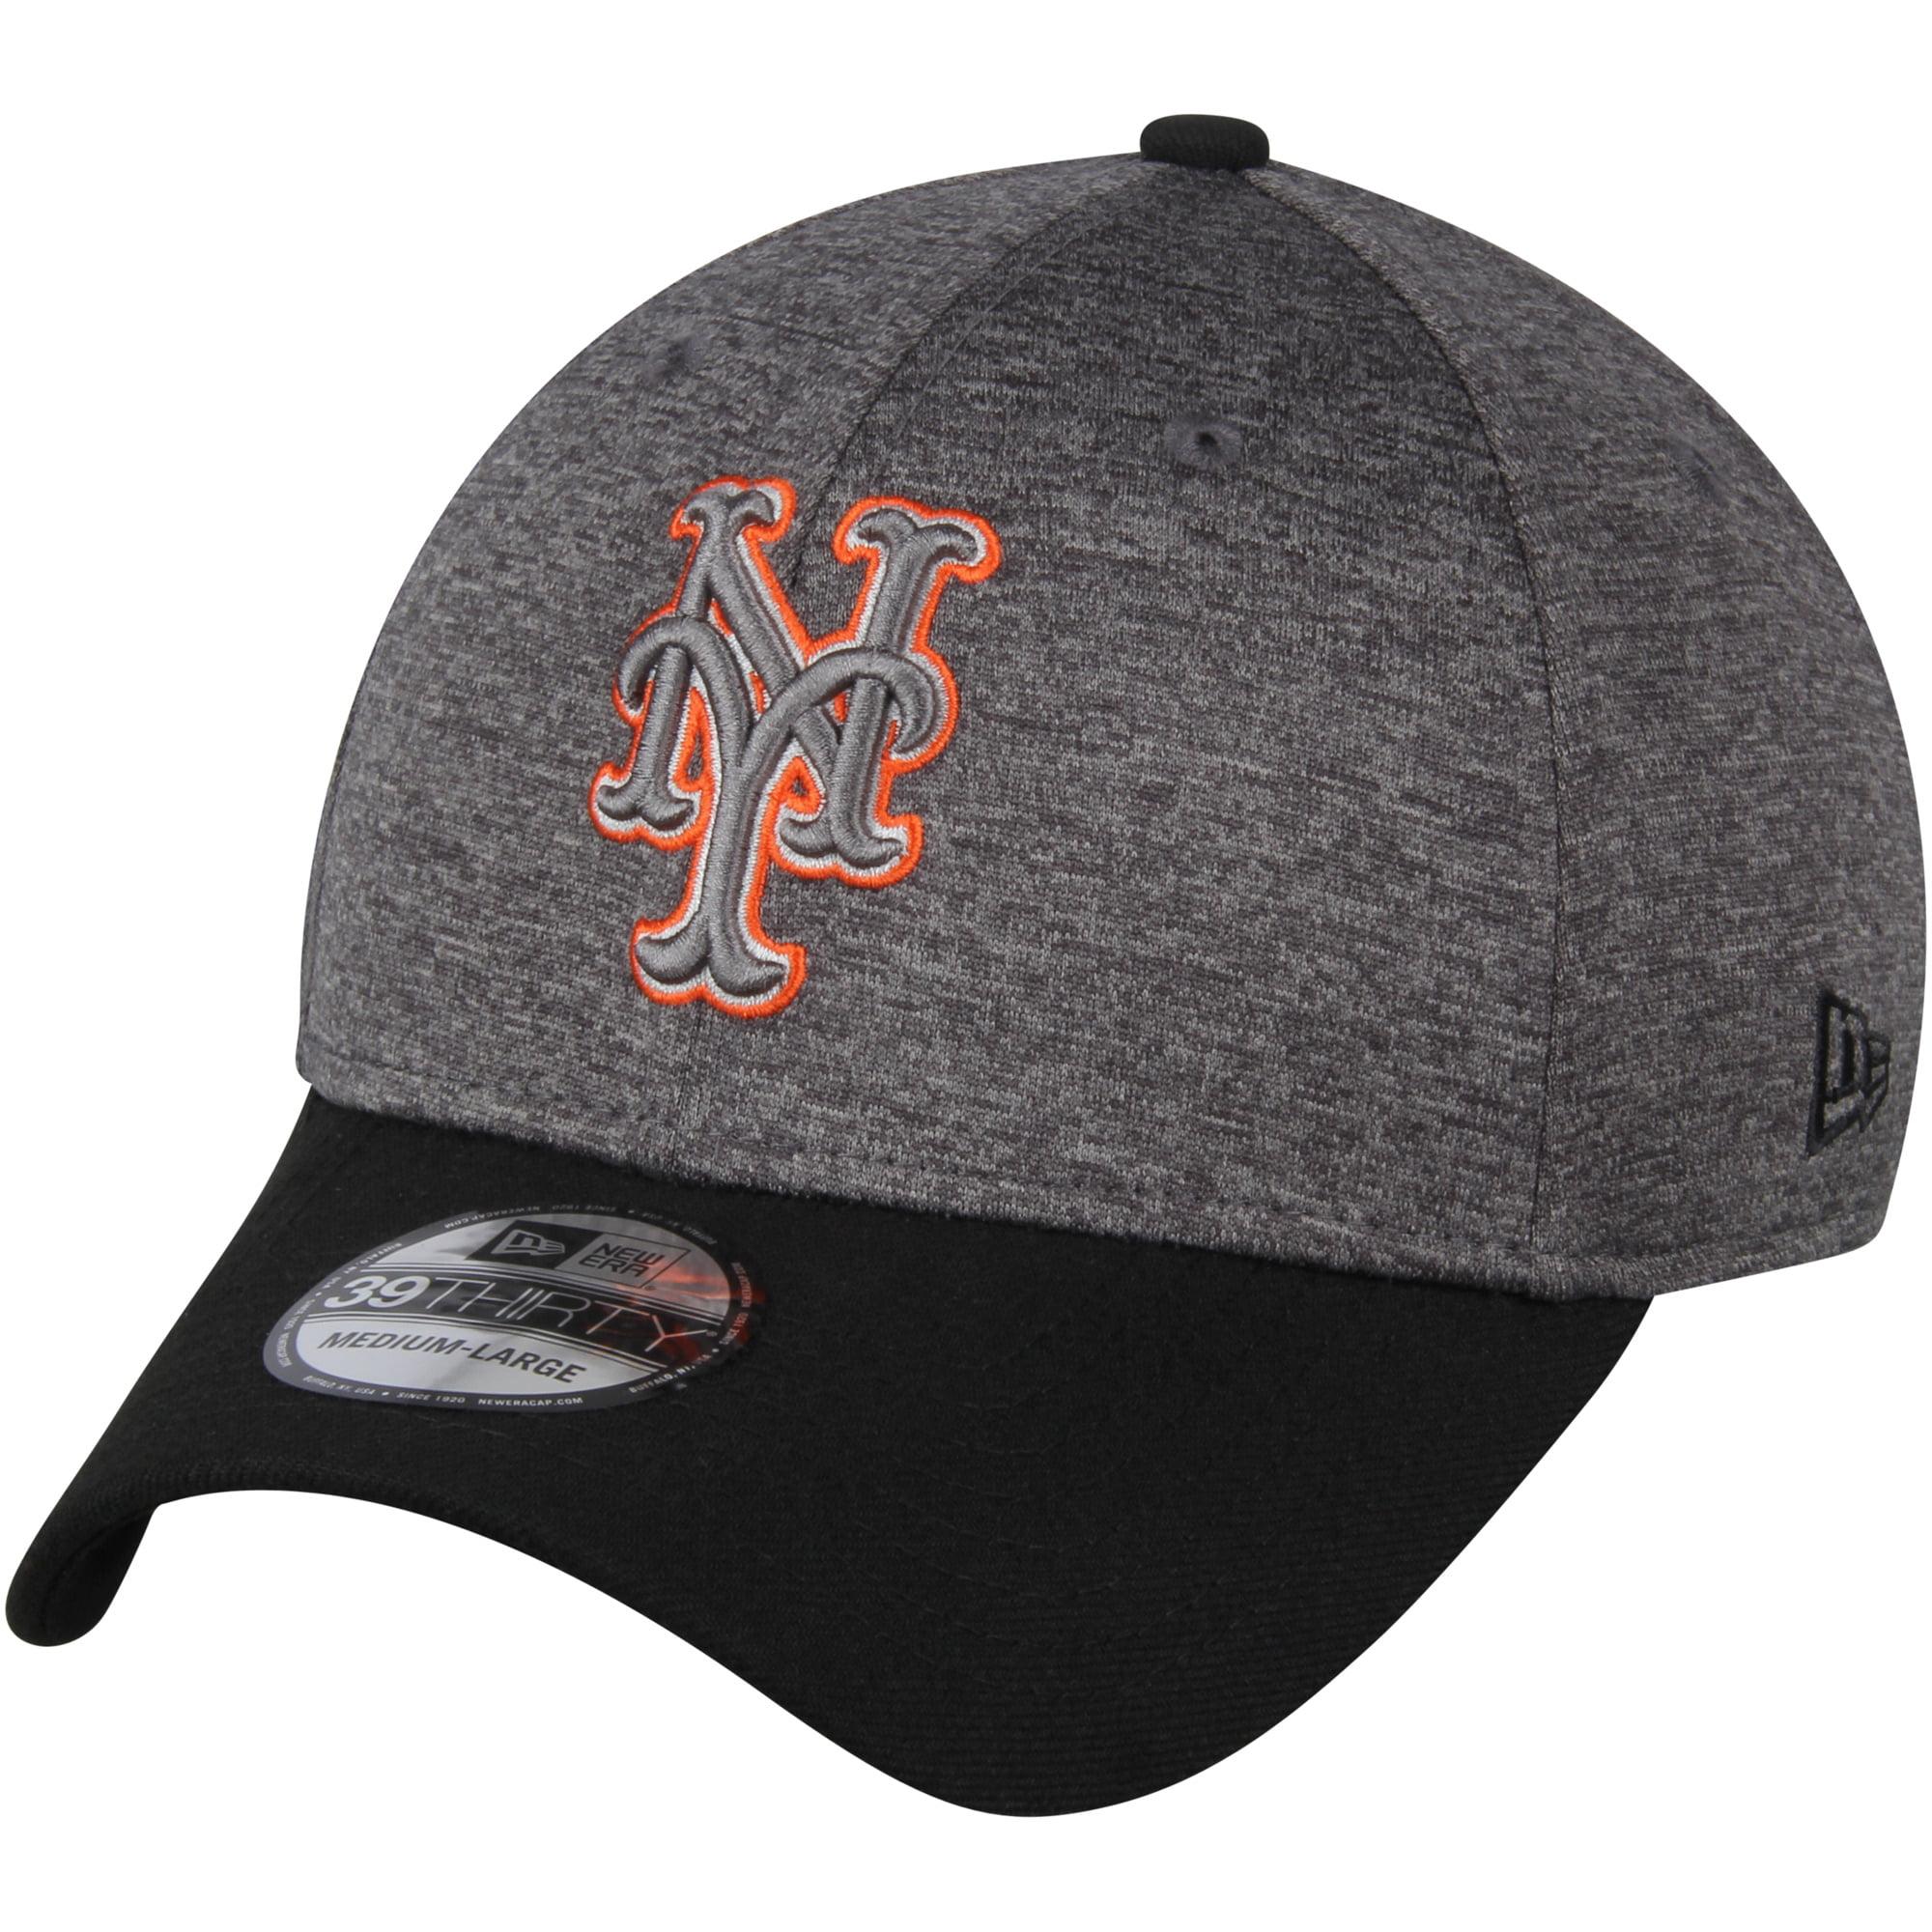 New York Mets New Era 39THIRTY Shadow Tech Color Pop Flex Hat - Heathered Gray/Black